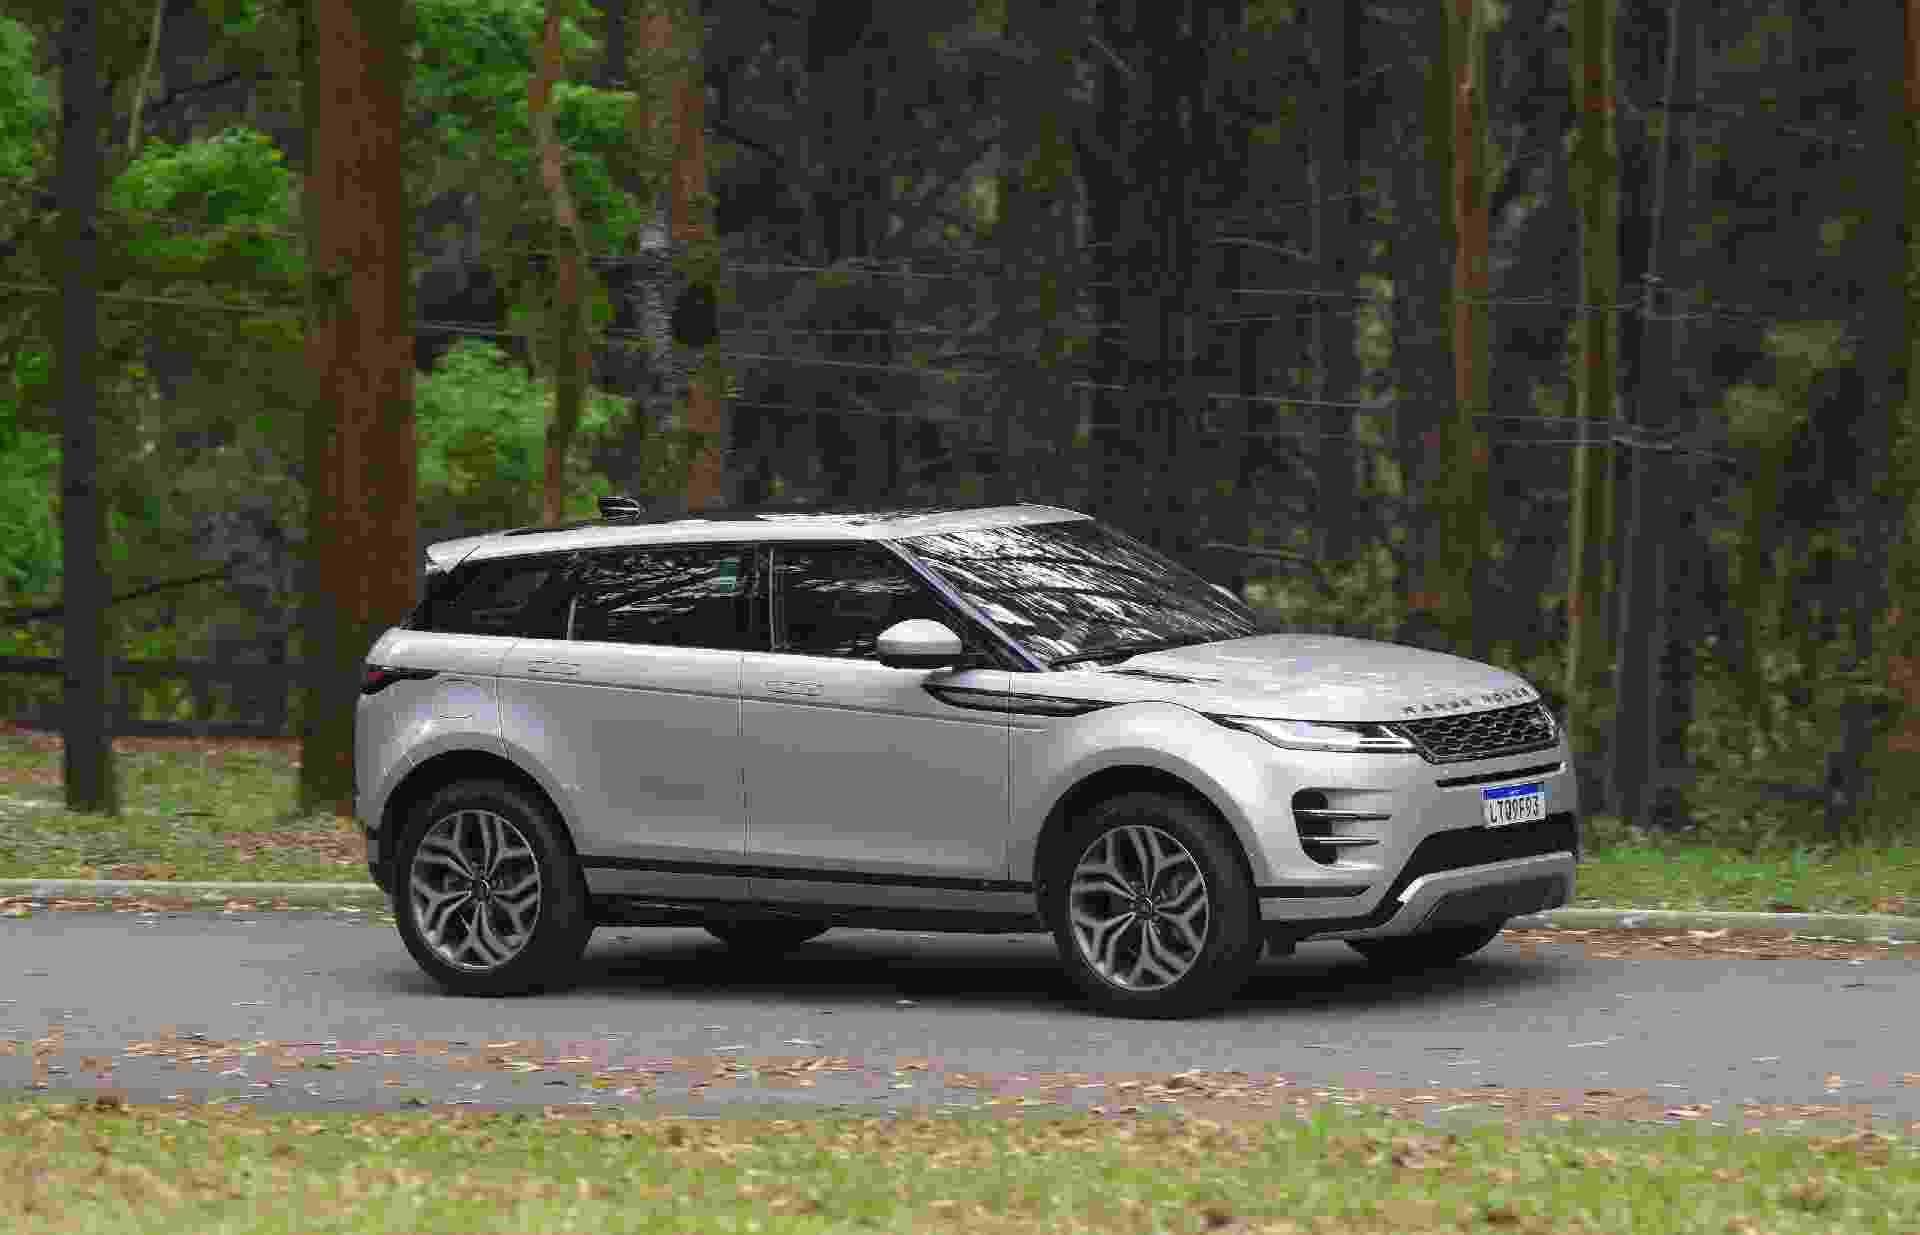 Range Rover Evoque HSE - Murilo Góes/UOL